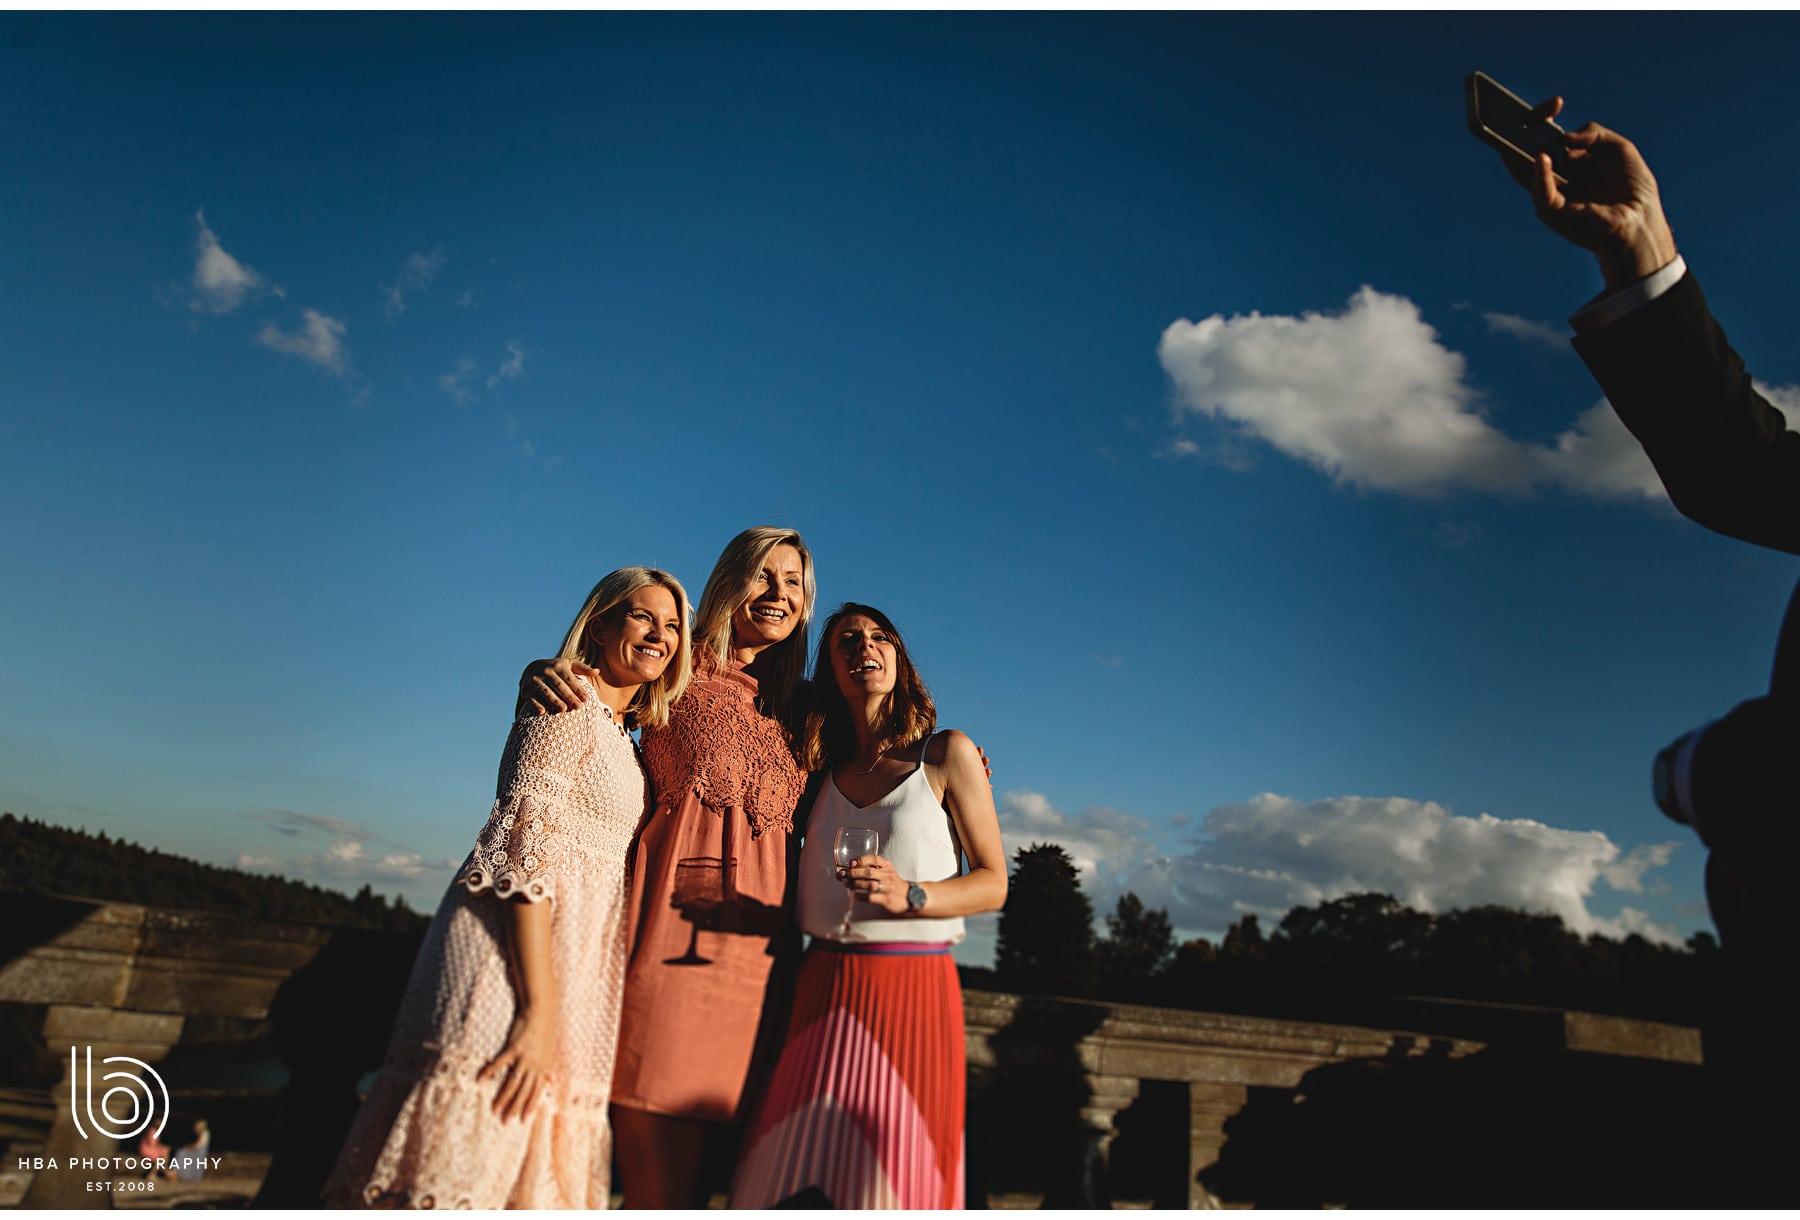 Osmaston_Park_Summer_Wedding_Photos_in_Ashbourne_Derbyshire